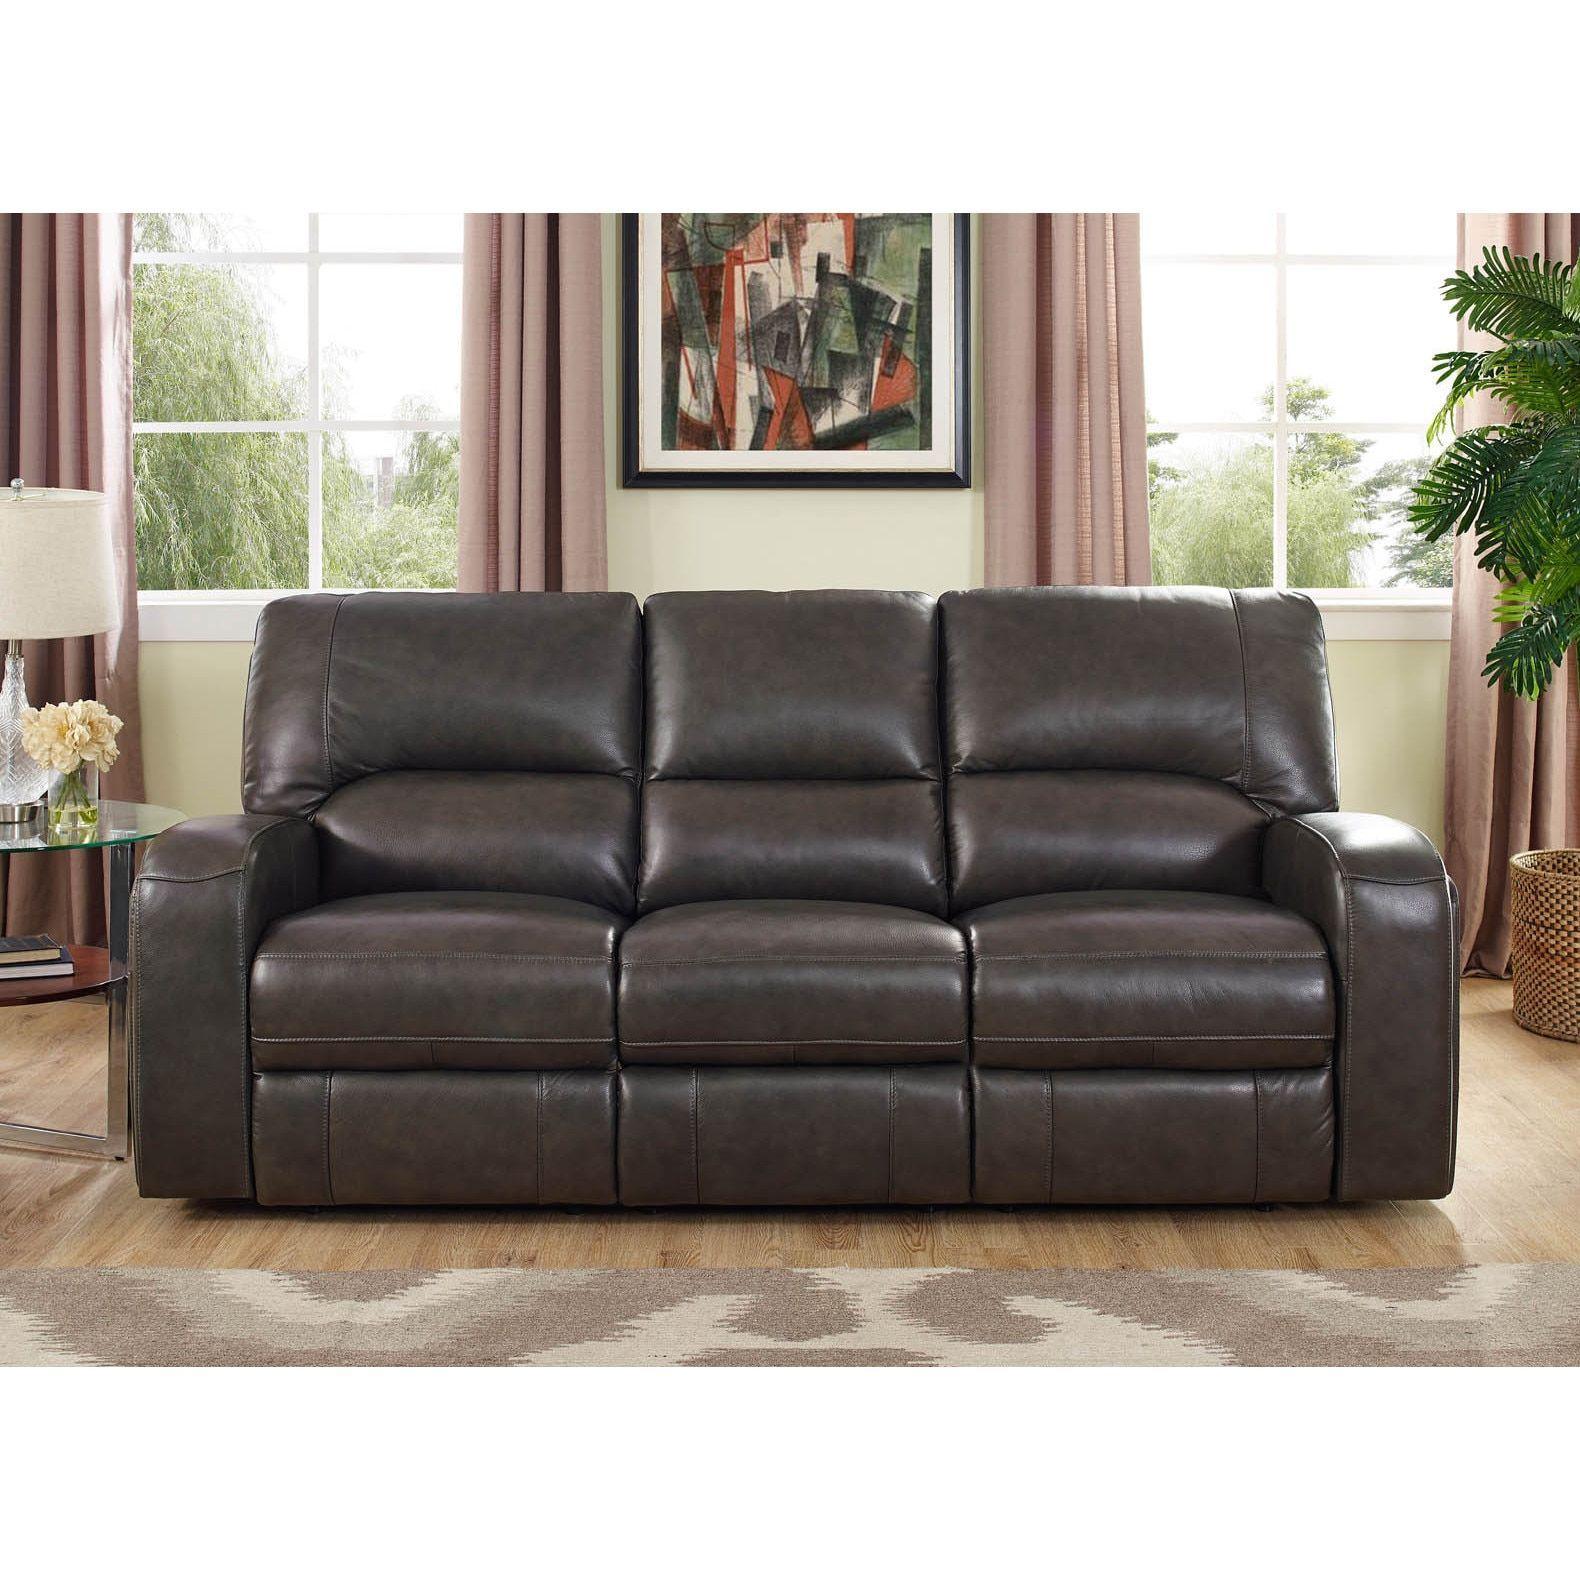 hydeline by amax newcastle top grain leather power reclining sofa rh pinterest co uk